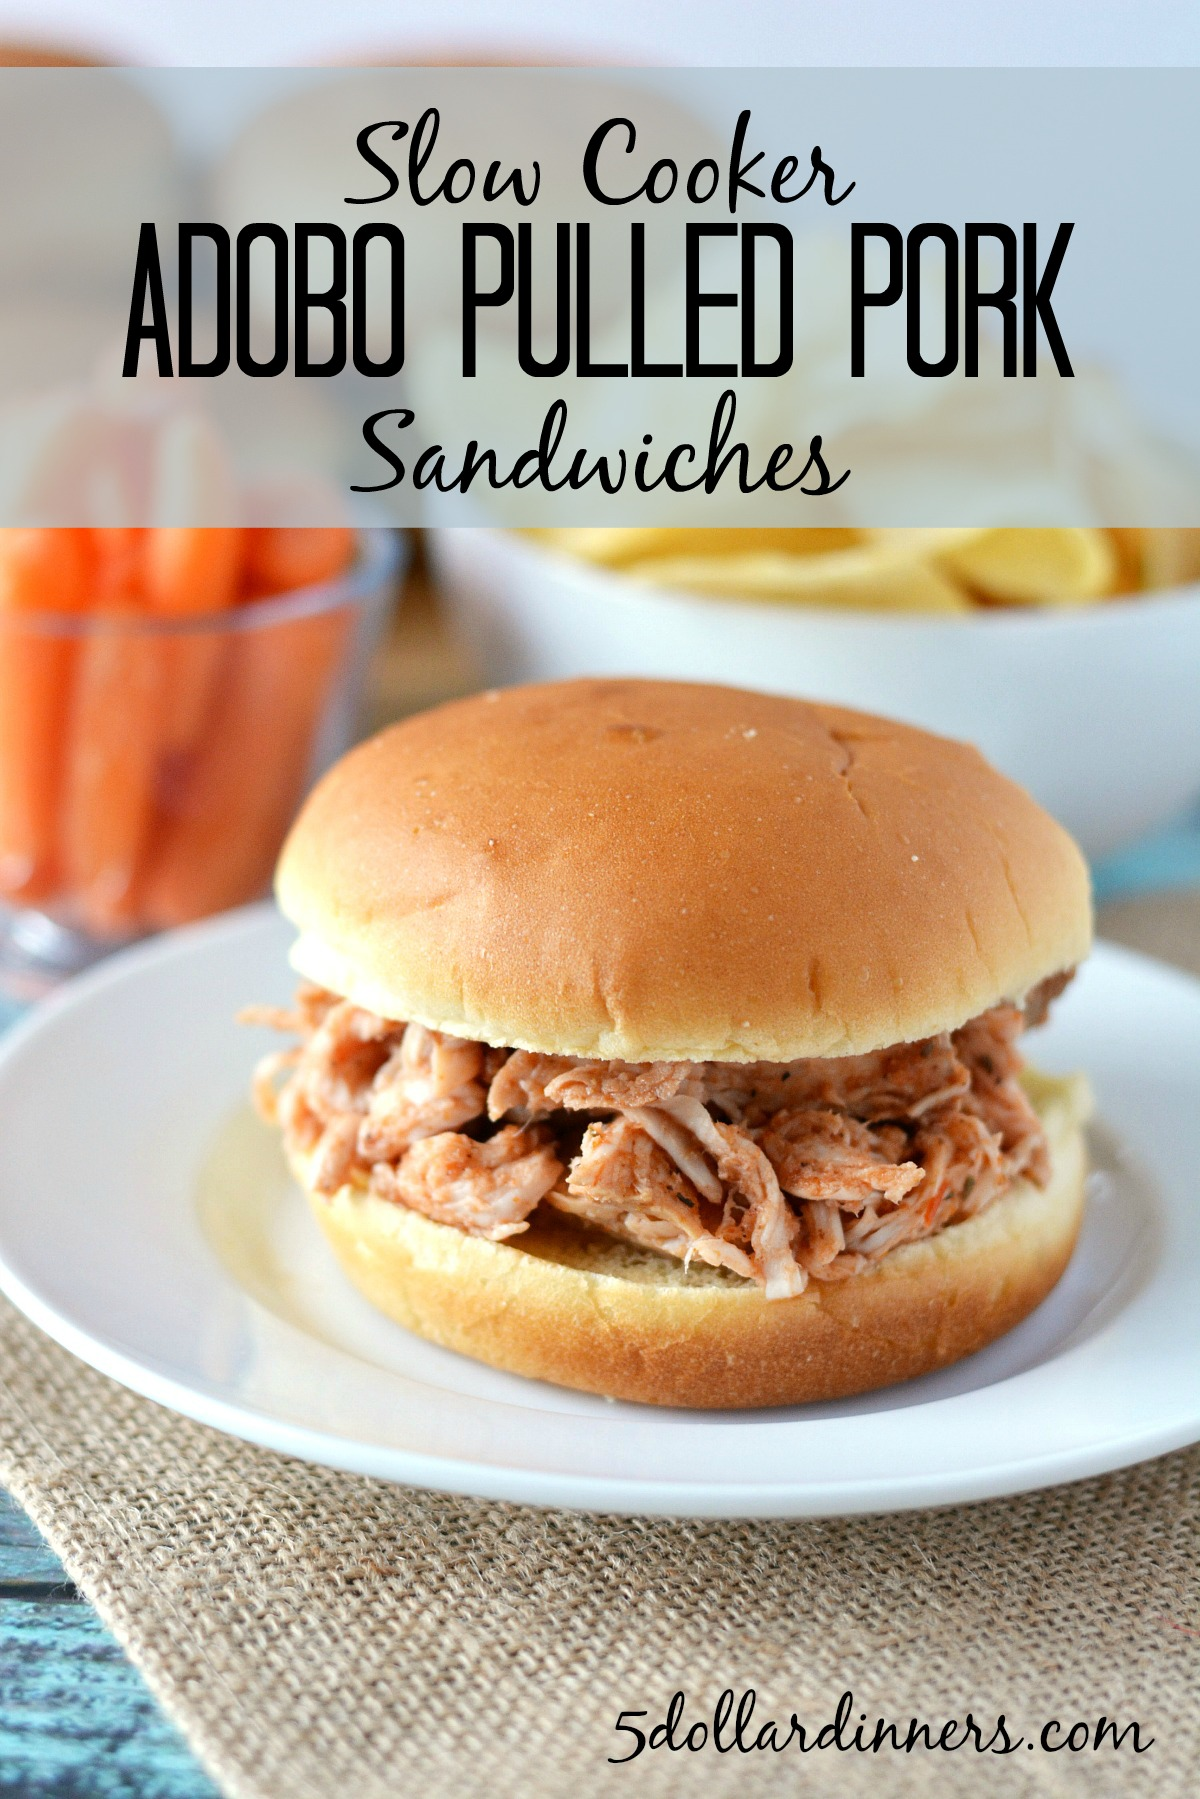 adobo pulled pork sandwiches